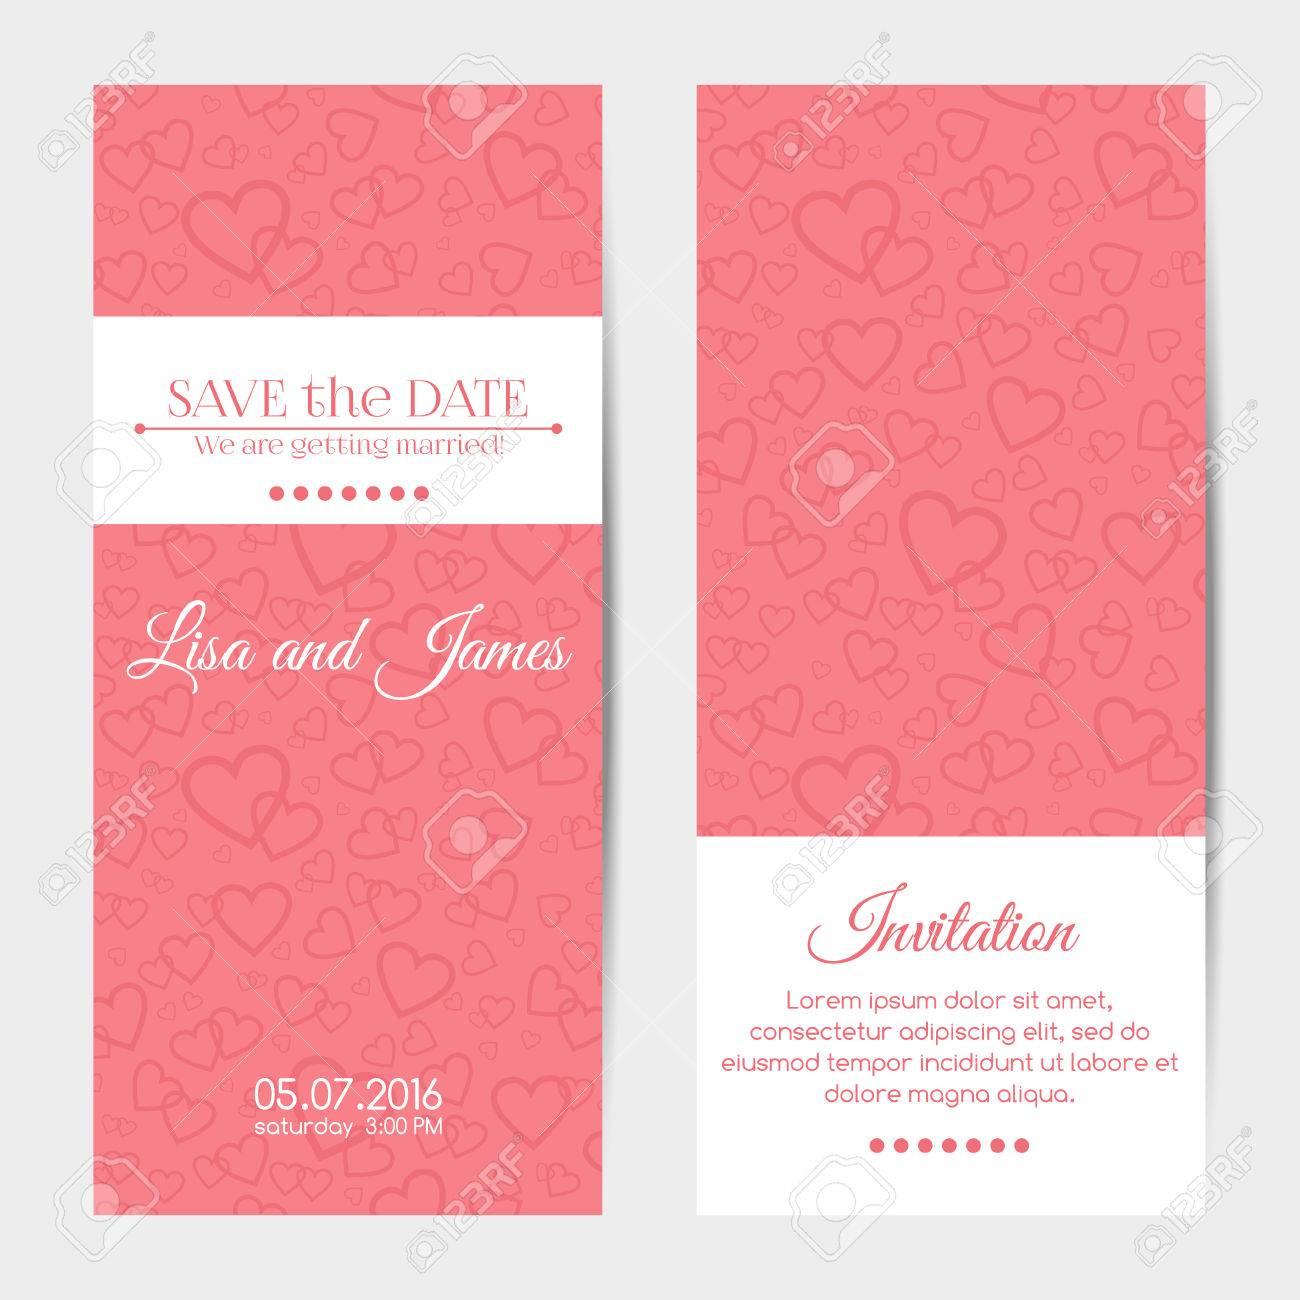 Vertical wedding invitation cards template royalty free cliparts banco de imagens vertical wedding invitation cards template stopboris Gallery